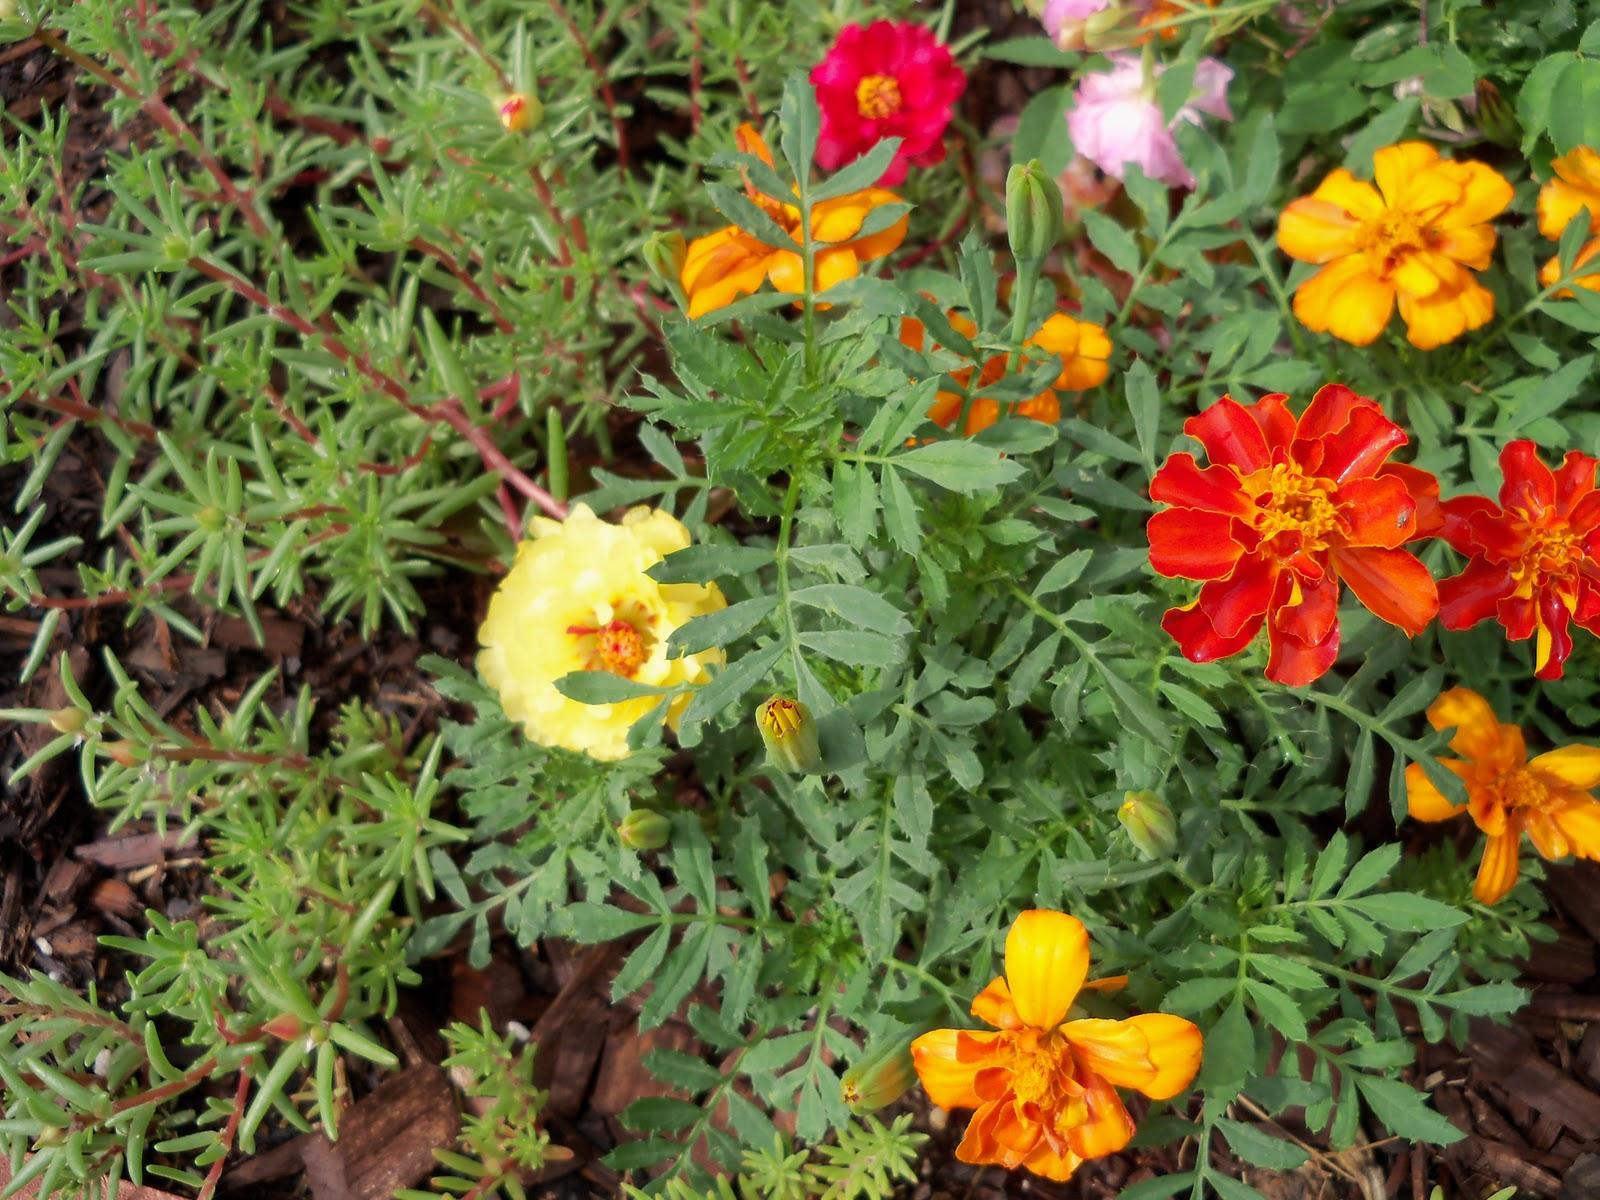 Gardening 2010, Part Two - 101_2183.JPG